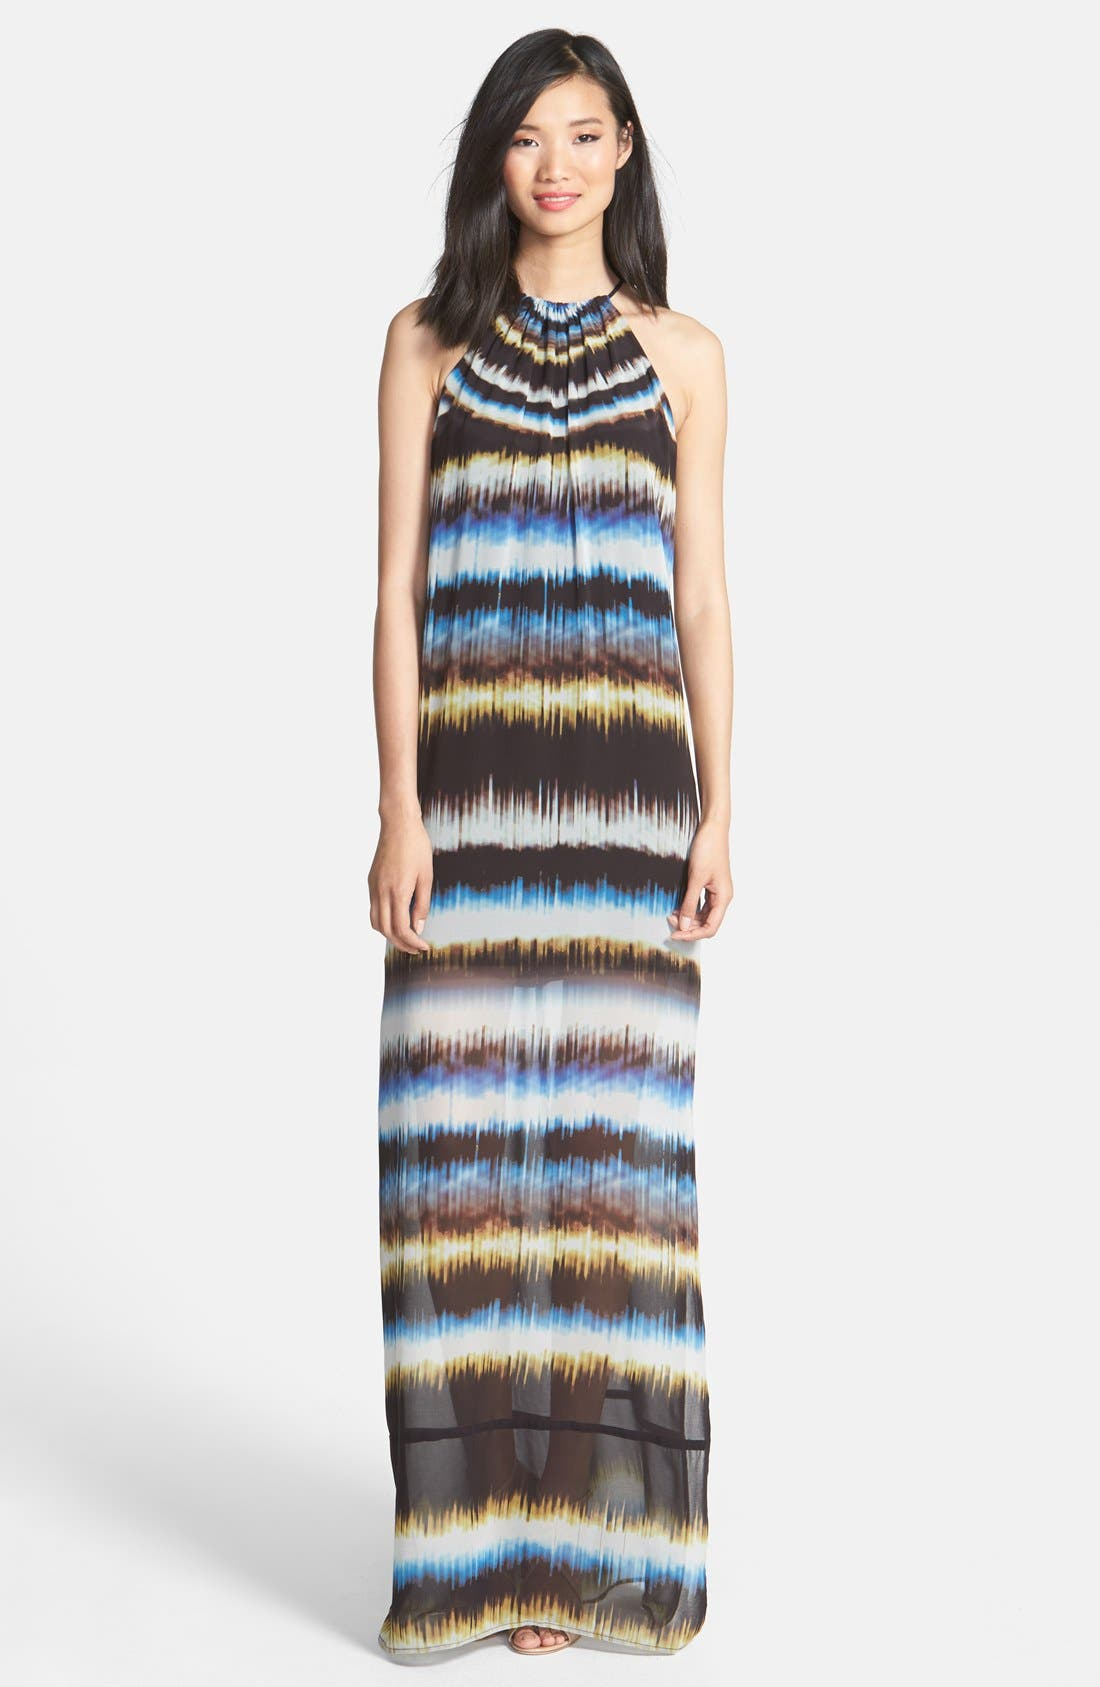 Main Image - Trina Turk 'Milian' Tie Dye Georgette Maxi Dress